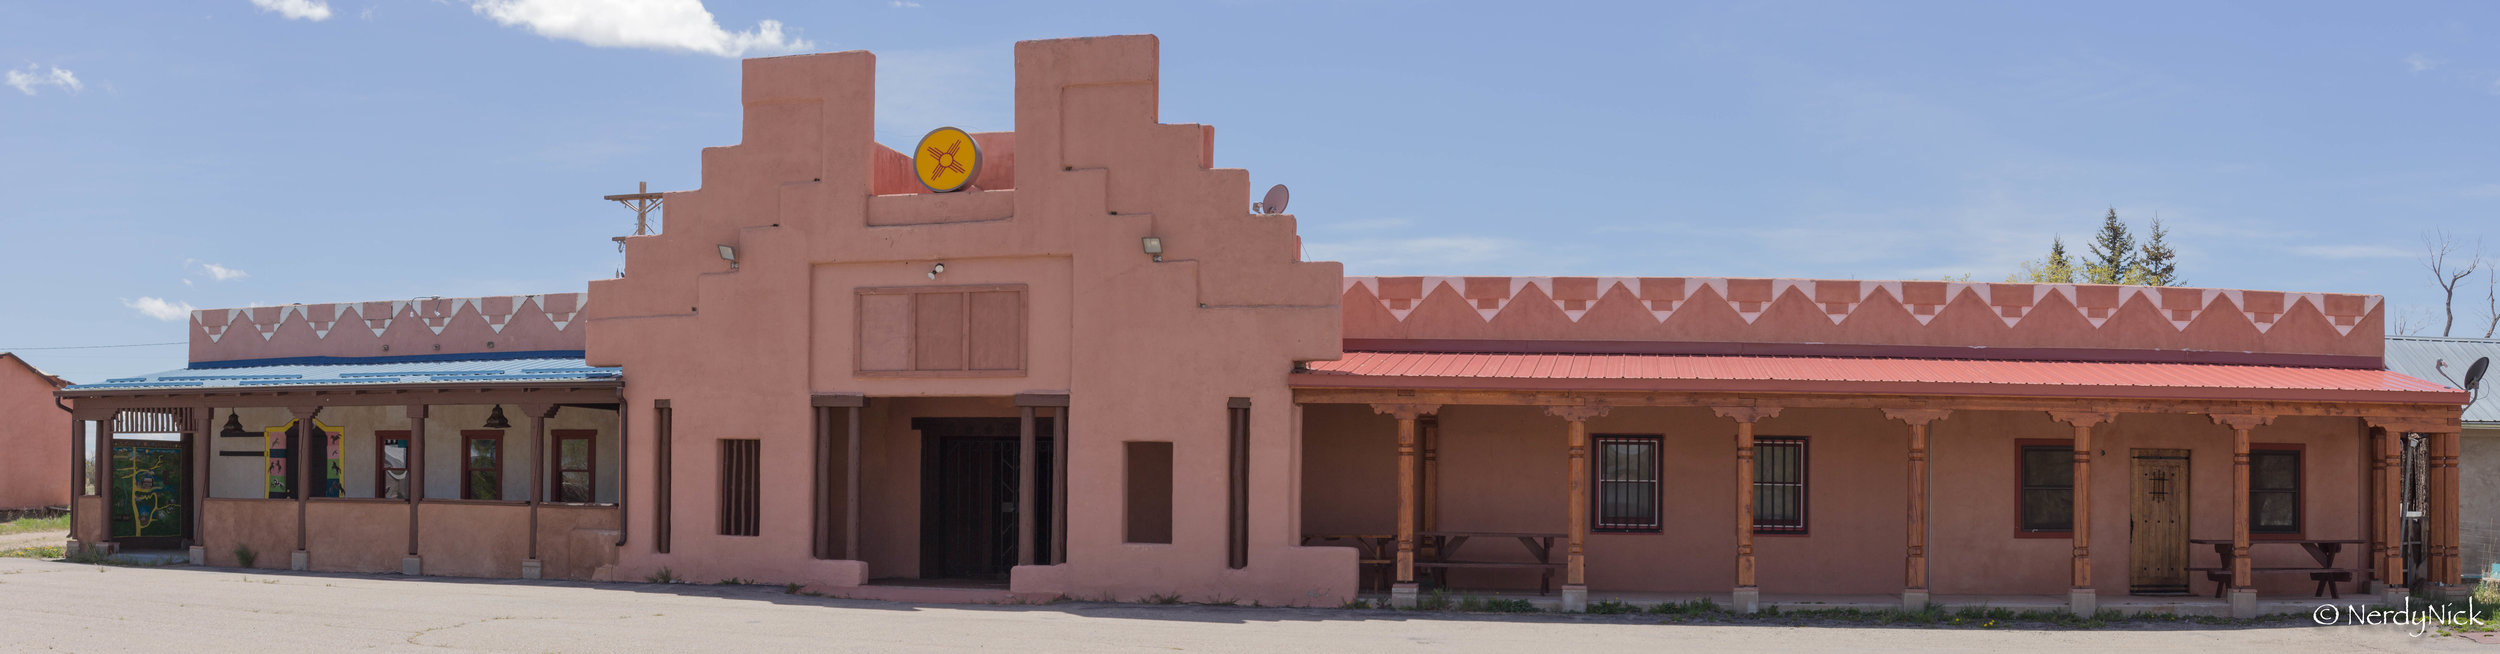 Fun little building we ran into in Costilla New Mexico